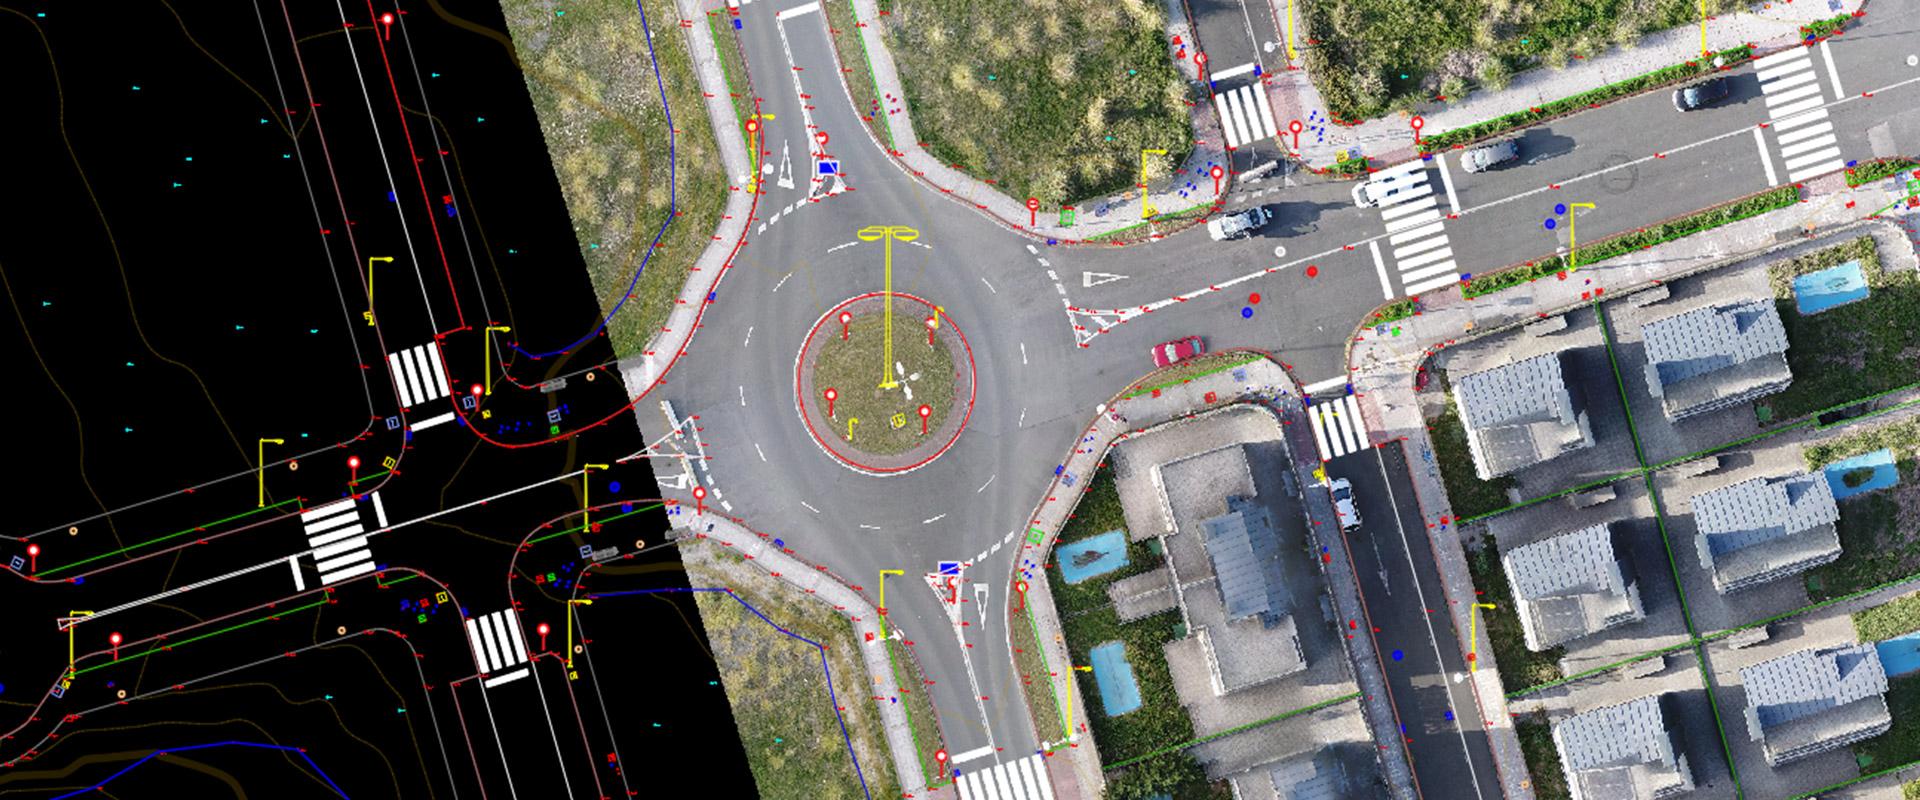 plano obtenido a partir de un vuelo fotogrametrico hecho con dron